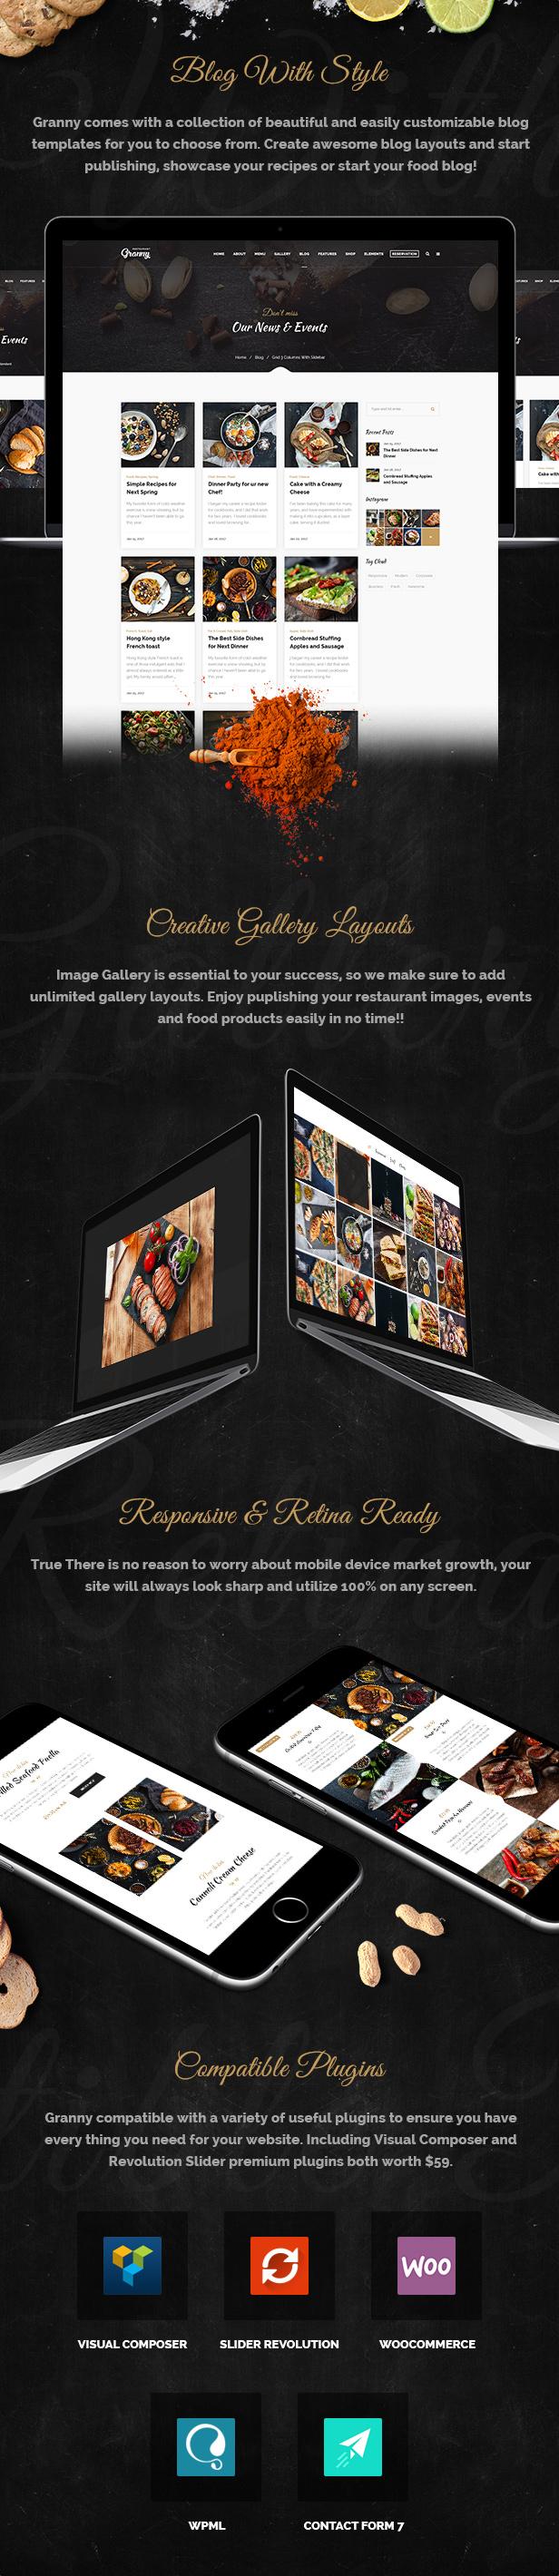 Restaurant Granny - Elegant Restaurant & Cafe WordPress Theme - 9